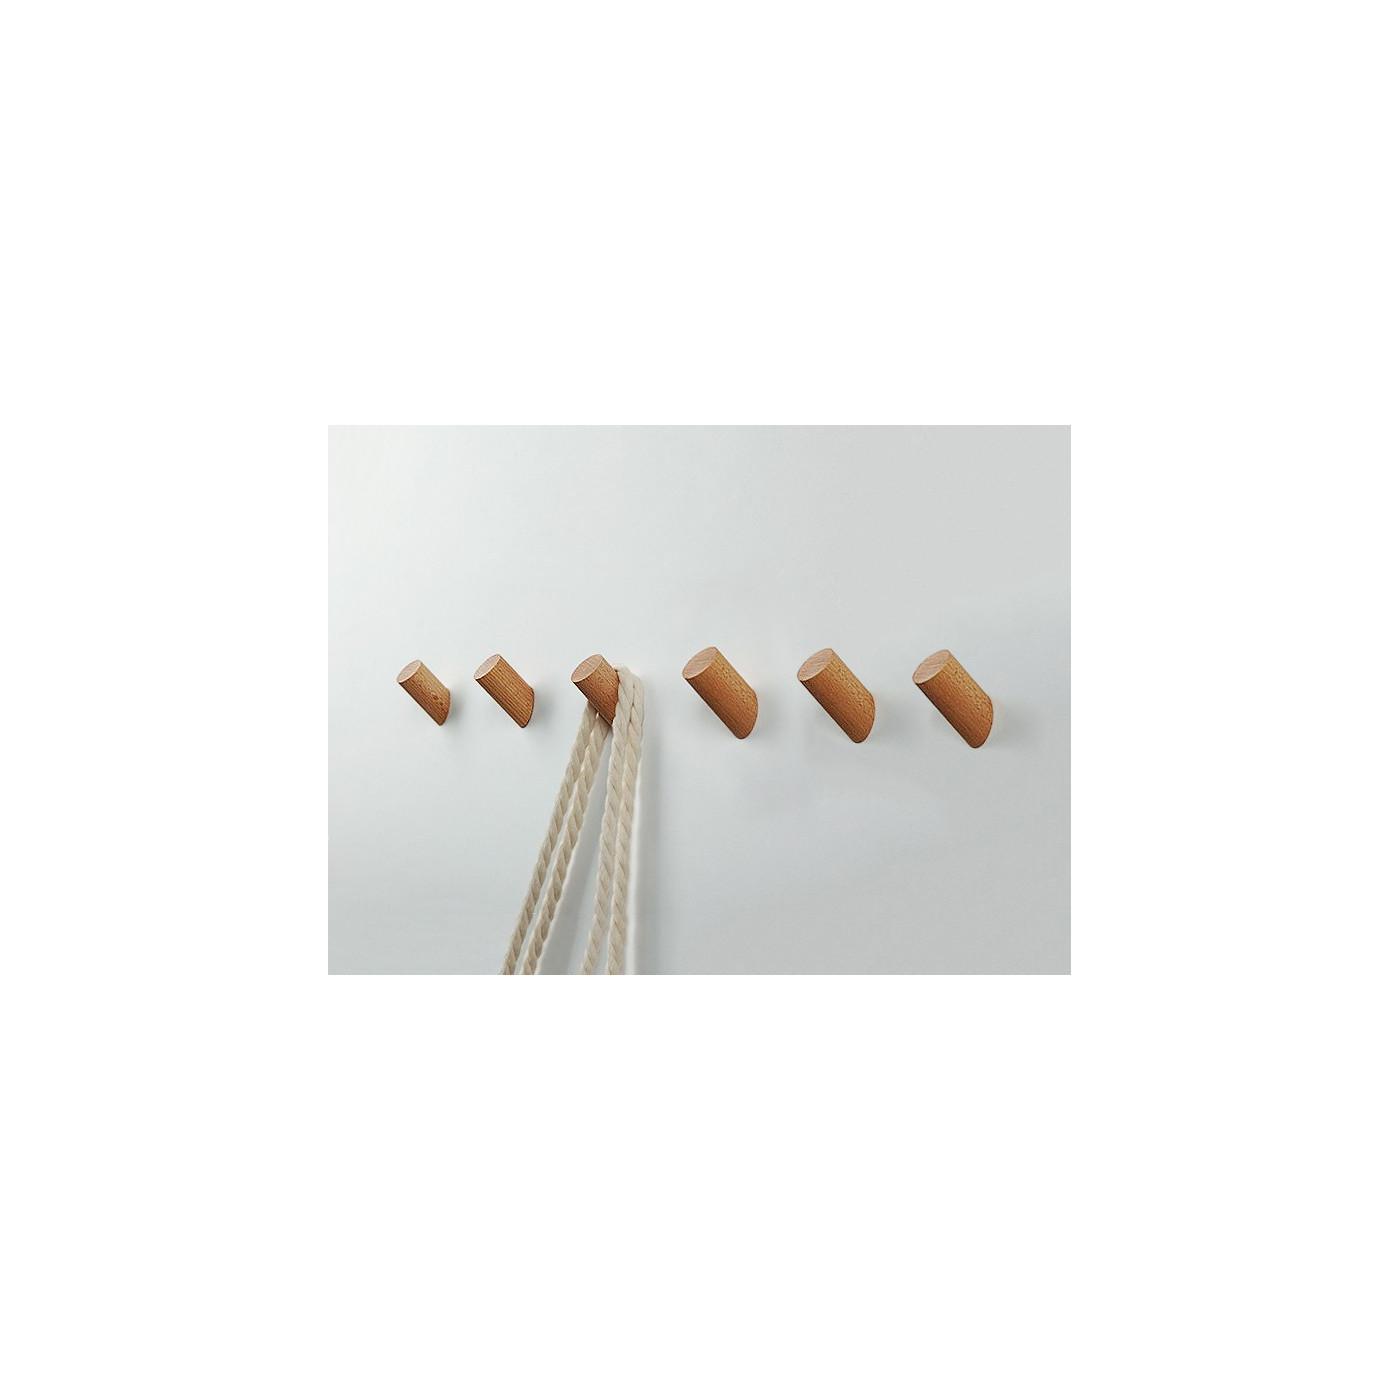 Conjunto de 6 ganchos de madera, madera de fresno  - 1